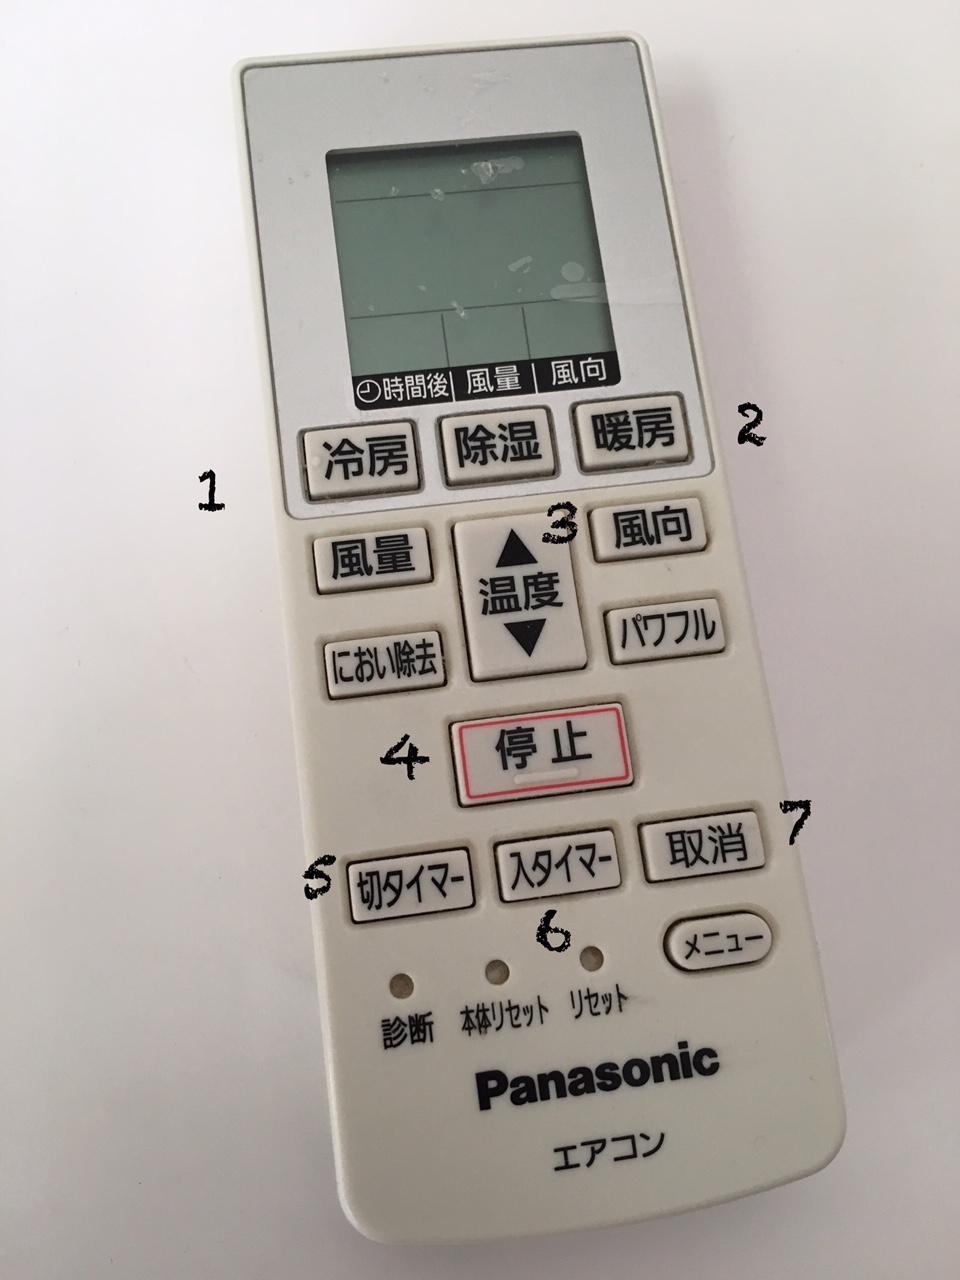 daikin aircon remote control manual